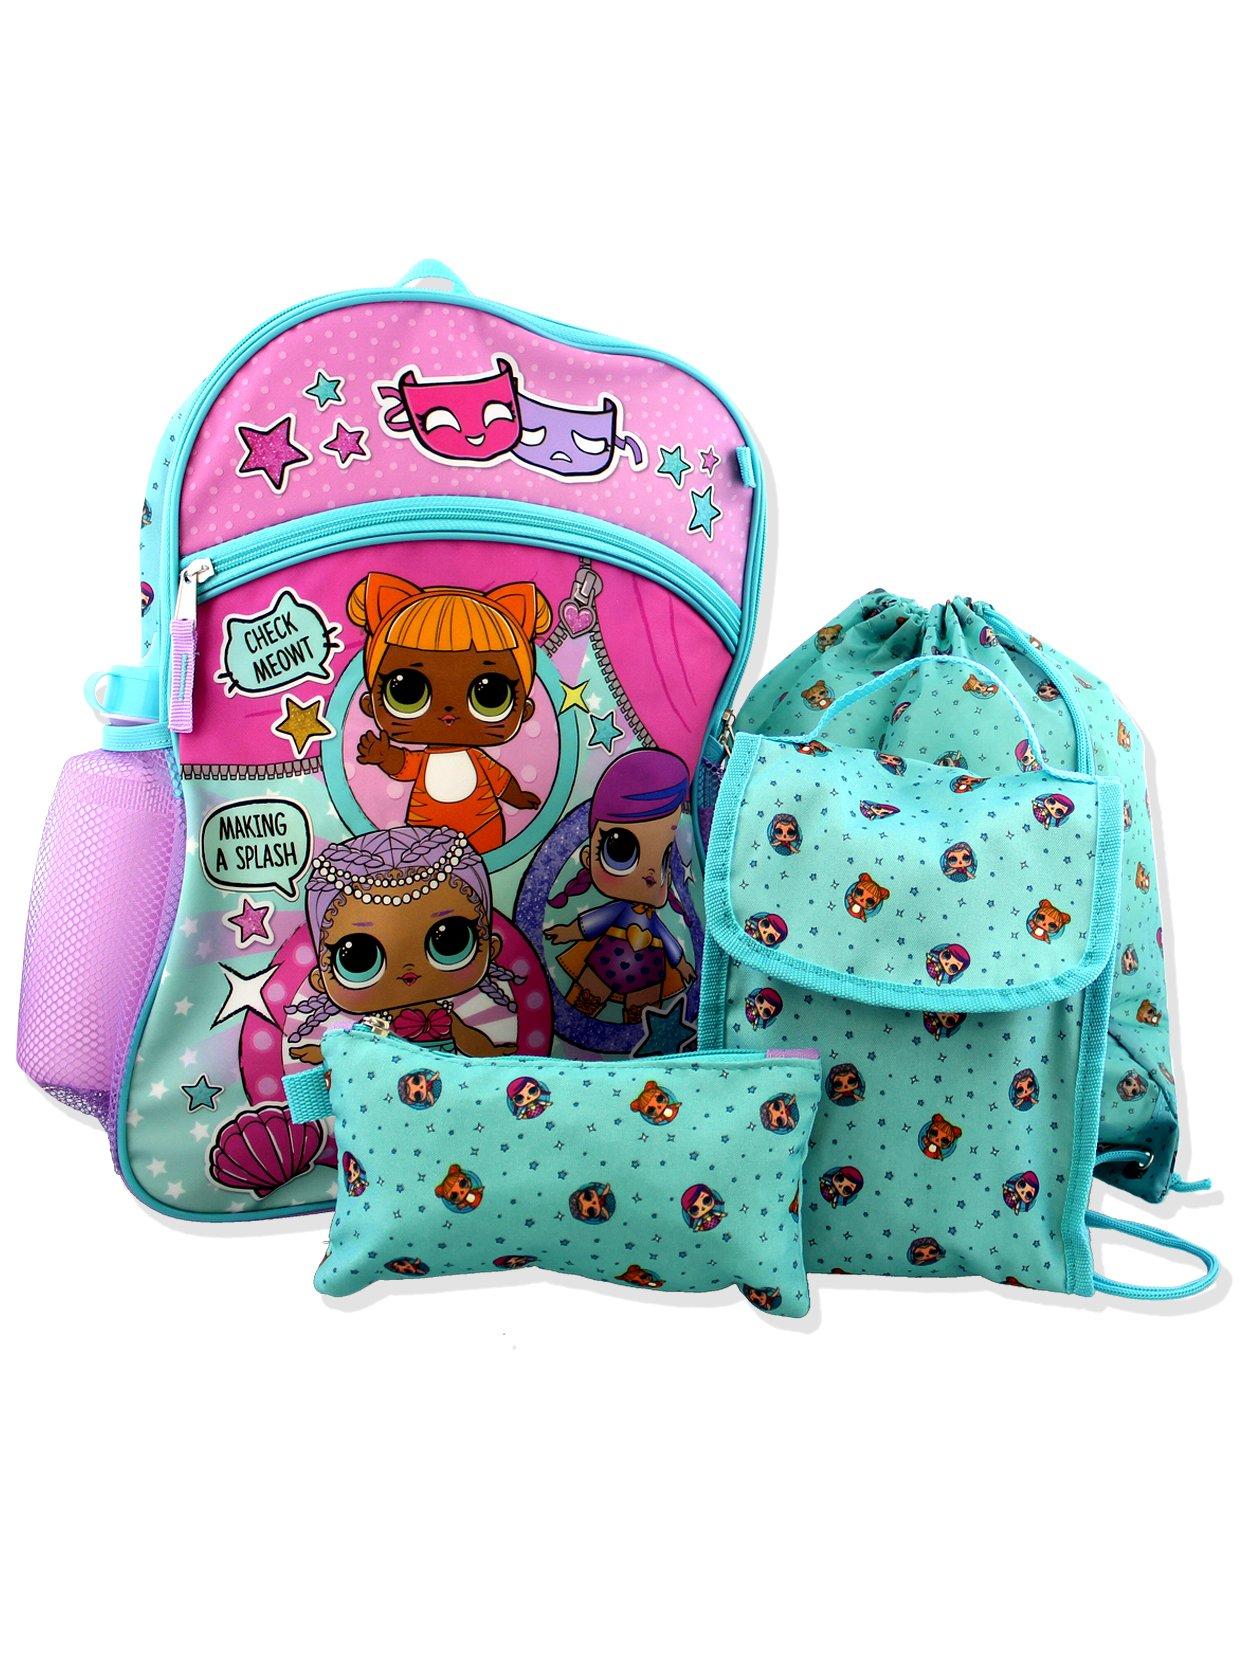 L.O.L Surprise! 5 Piece Backpack School Set (Blue/Pink)